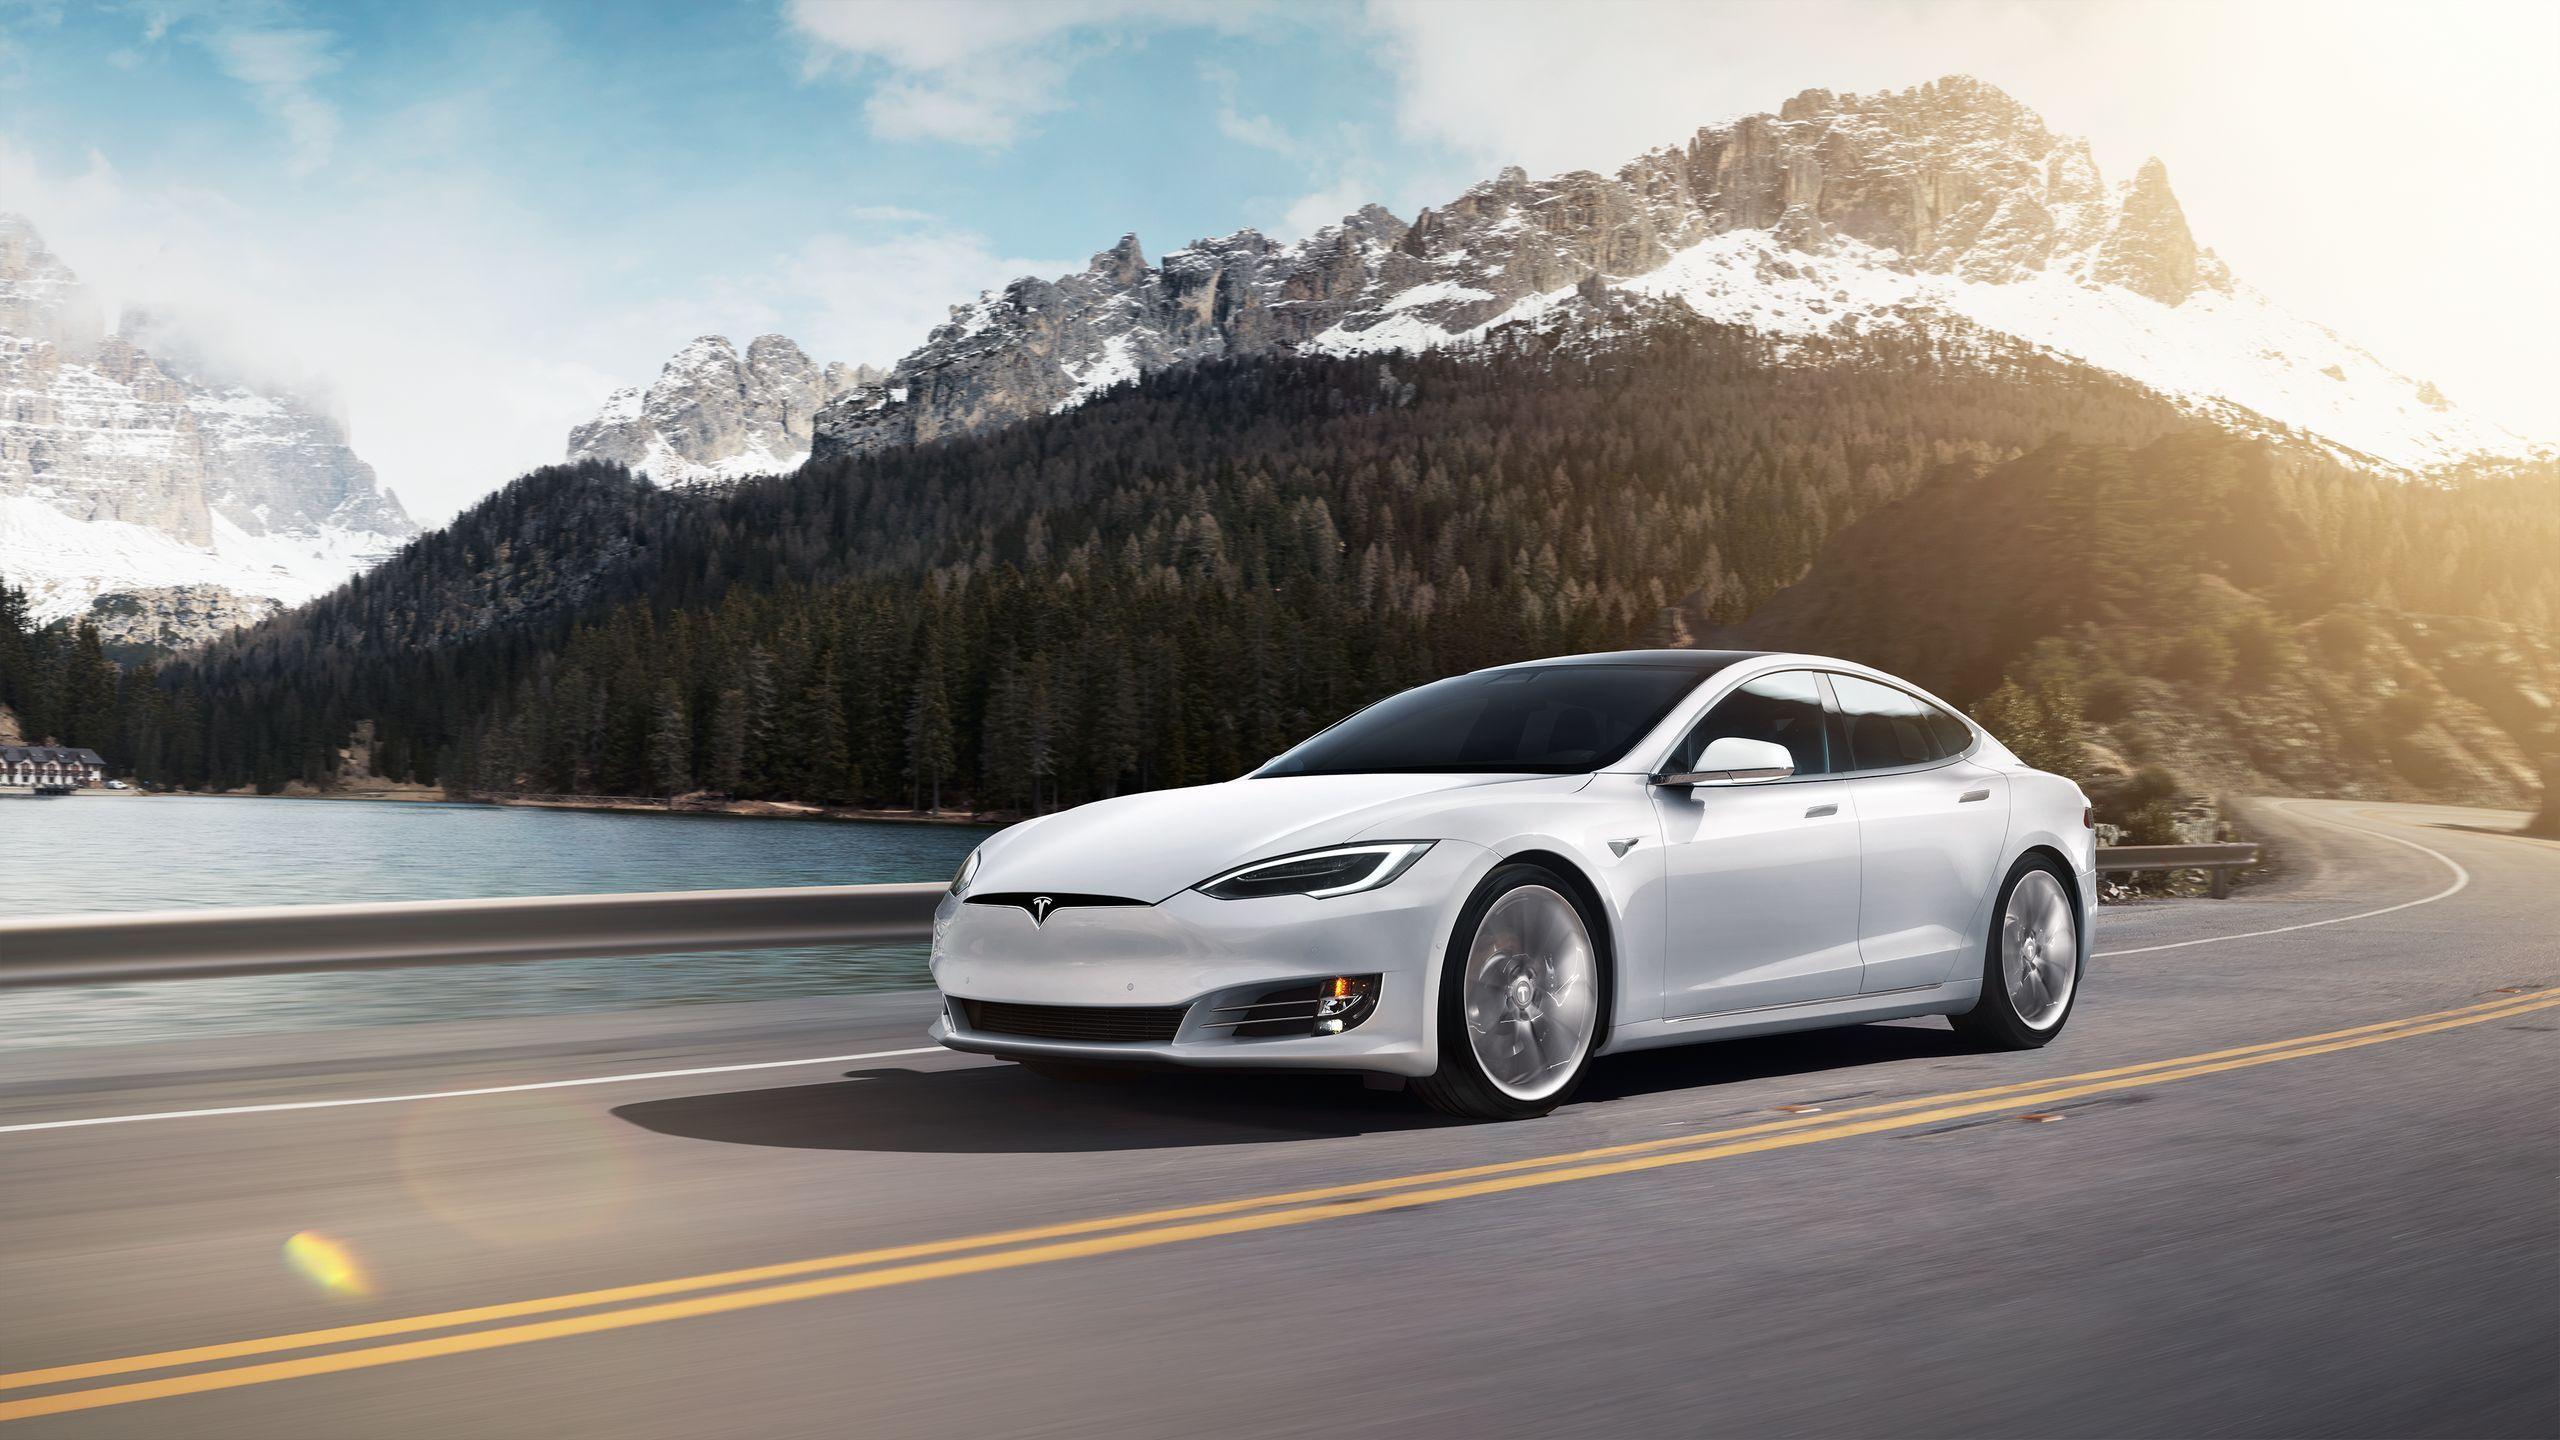 White Tesla Model 3 Wallpapers Top Free White Tesla Model 3 Backgrounds Wallpaperaccess